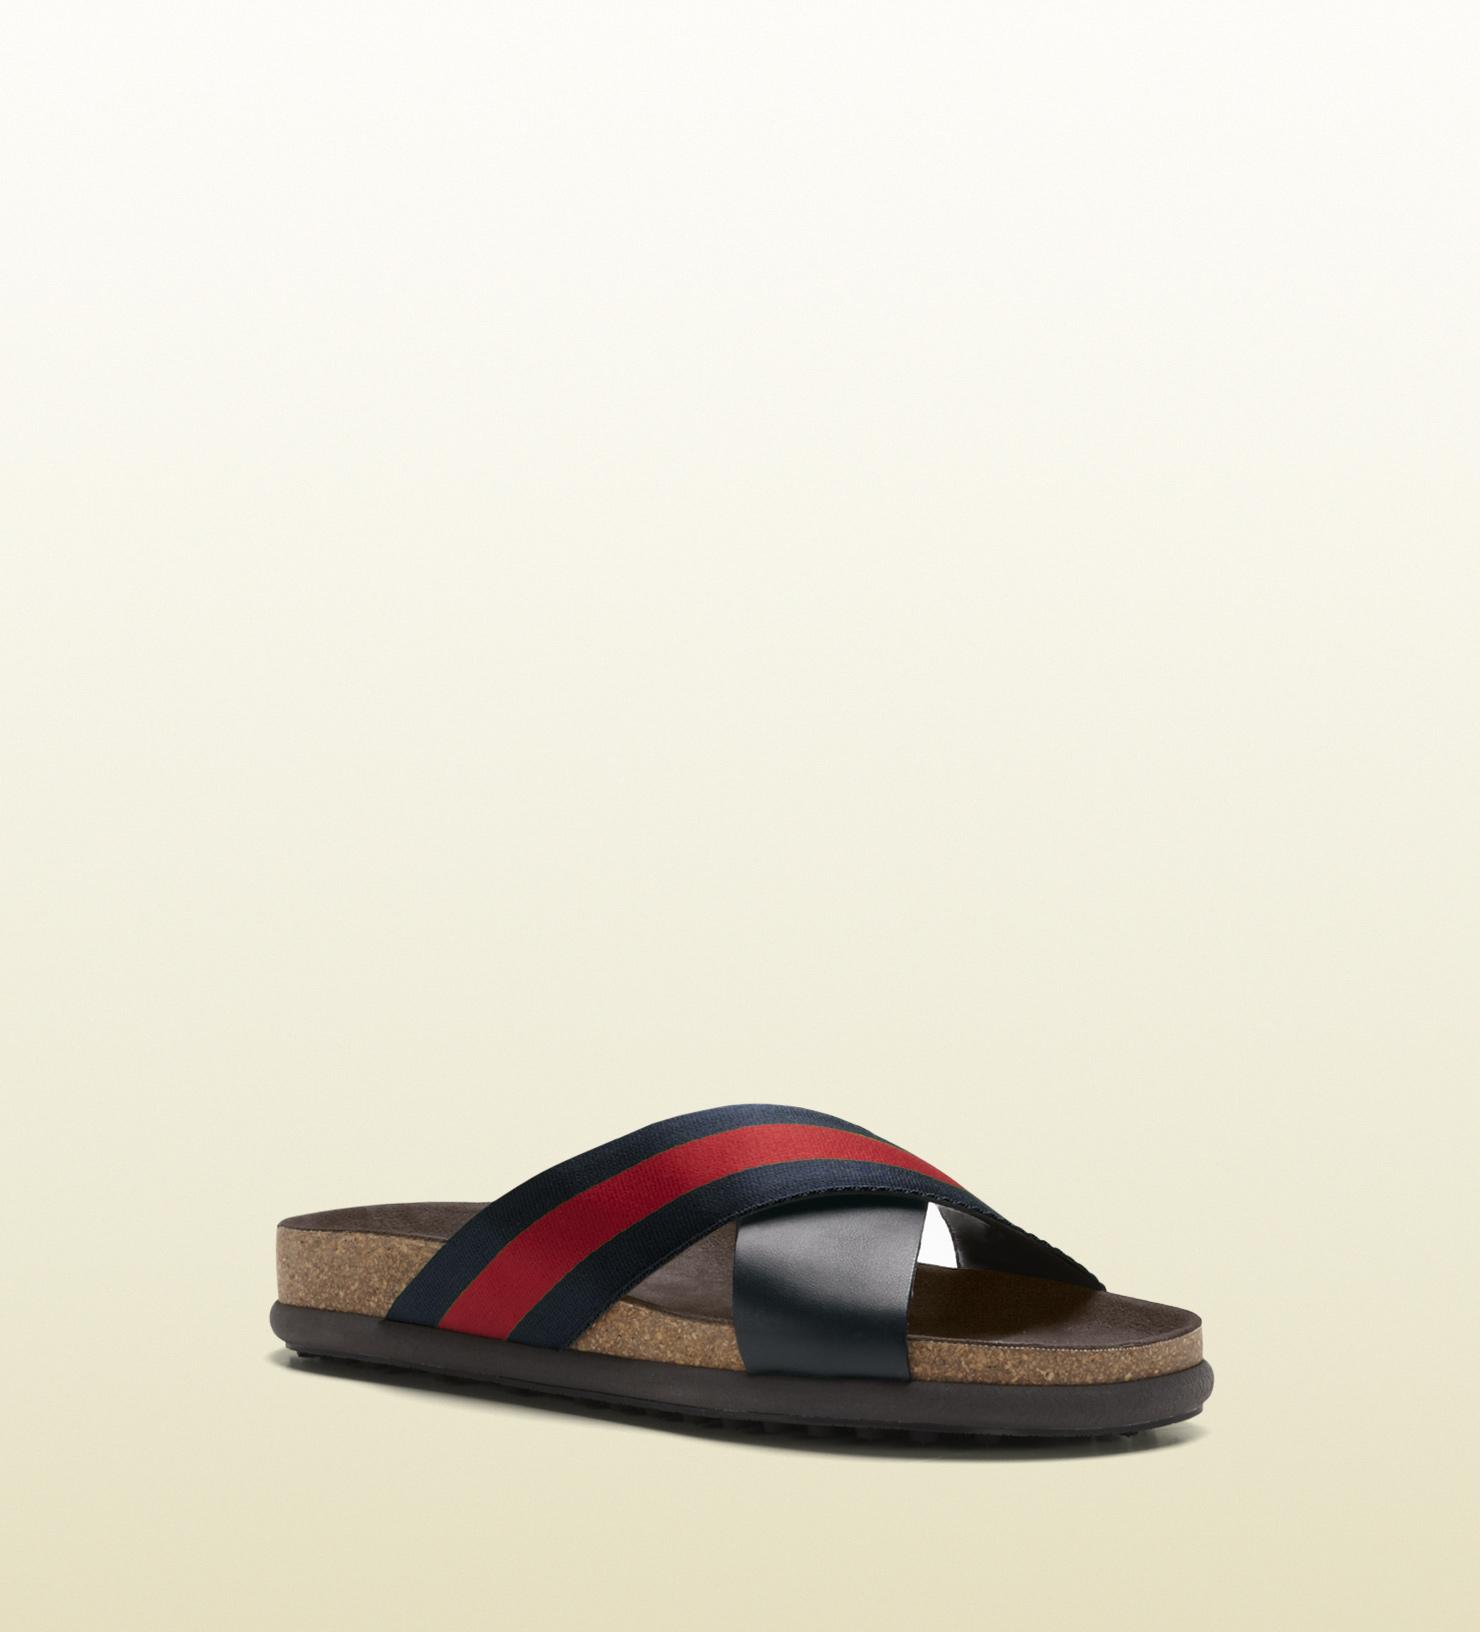 67f42471583f41 Lyst - Gucci Signature Web Slide Sandal in Blue for Men